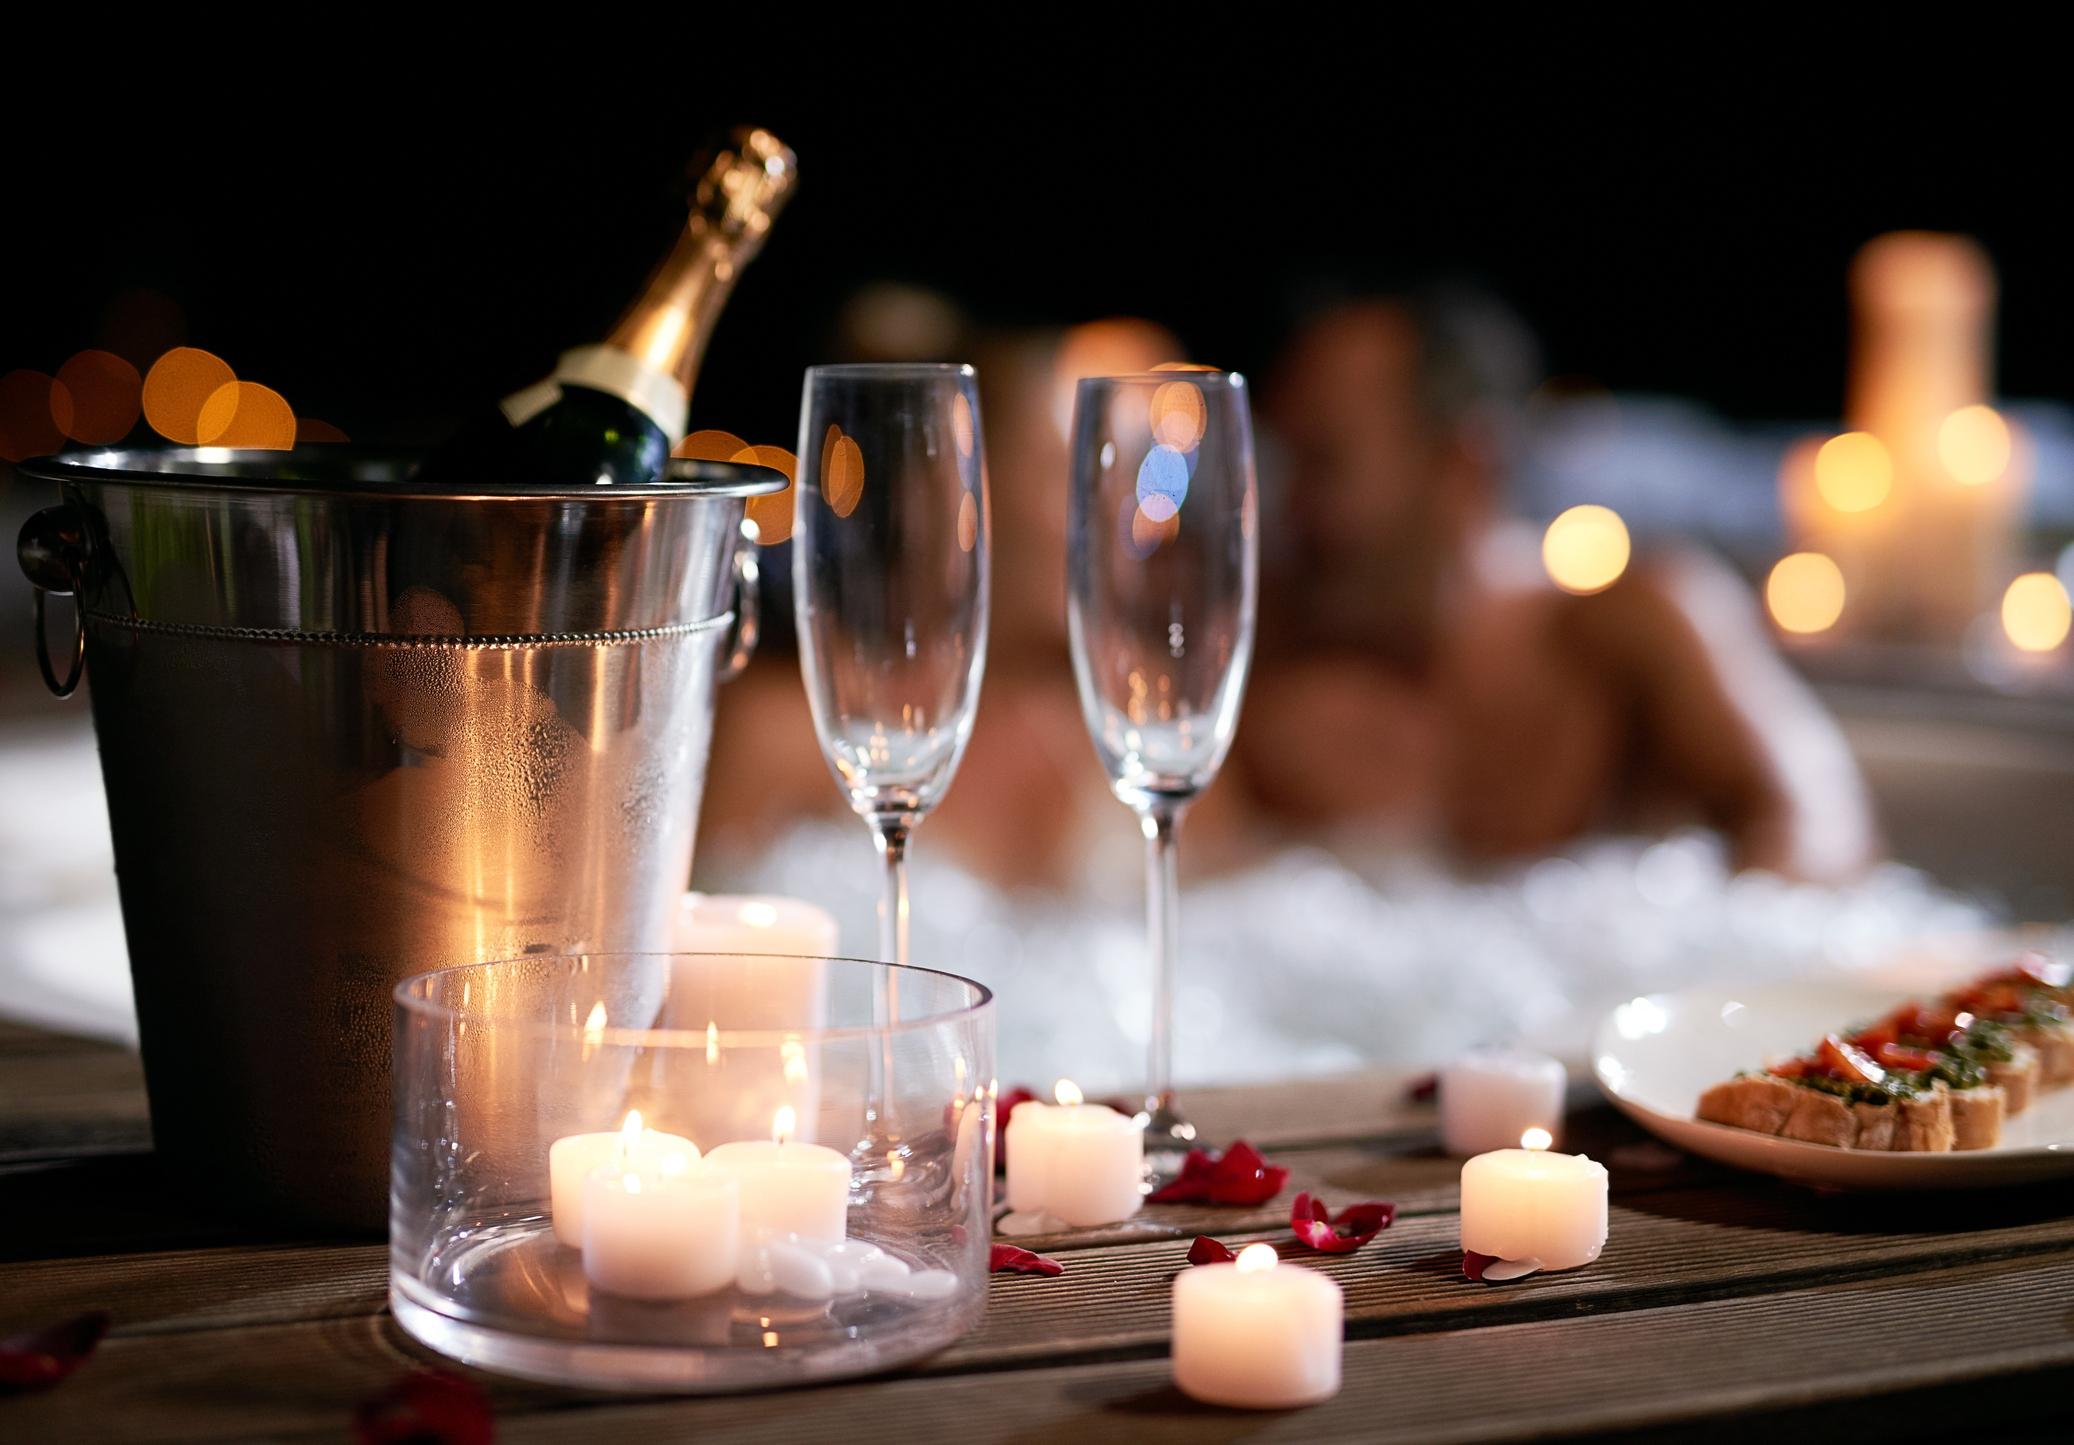 Romantic Hot Tub Setting